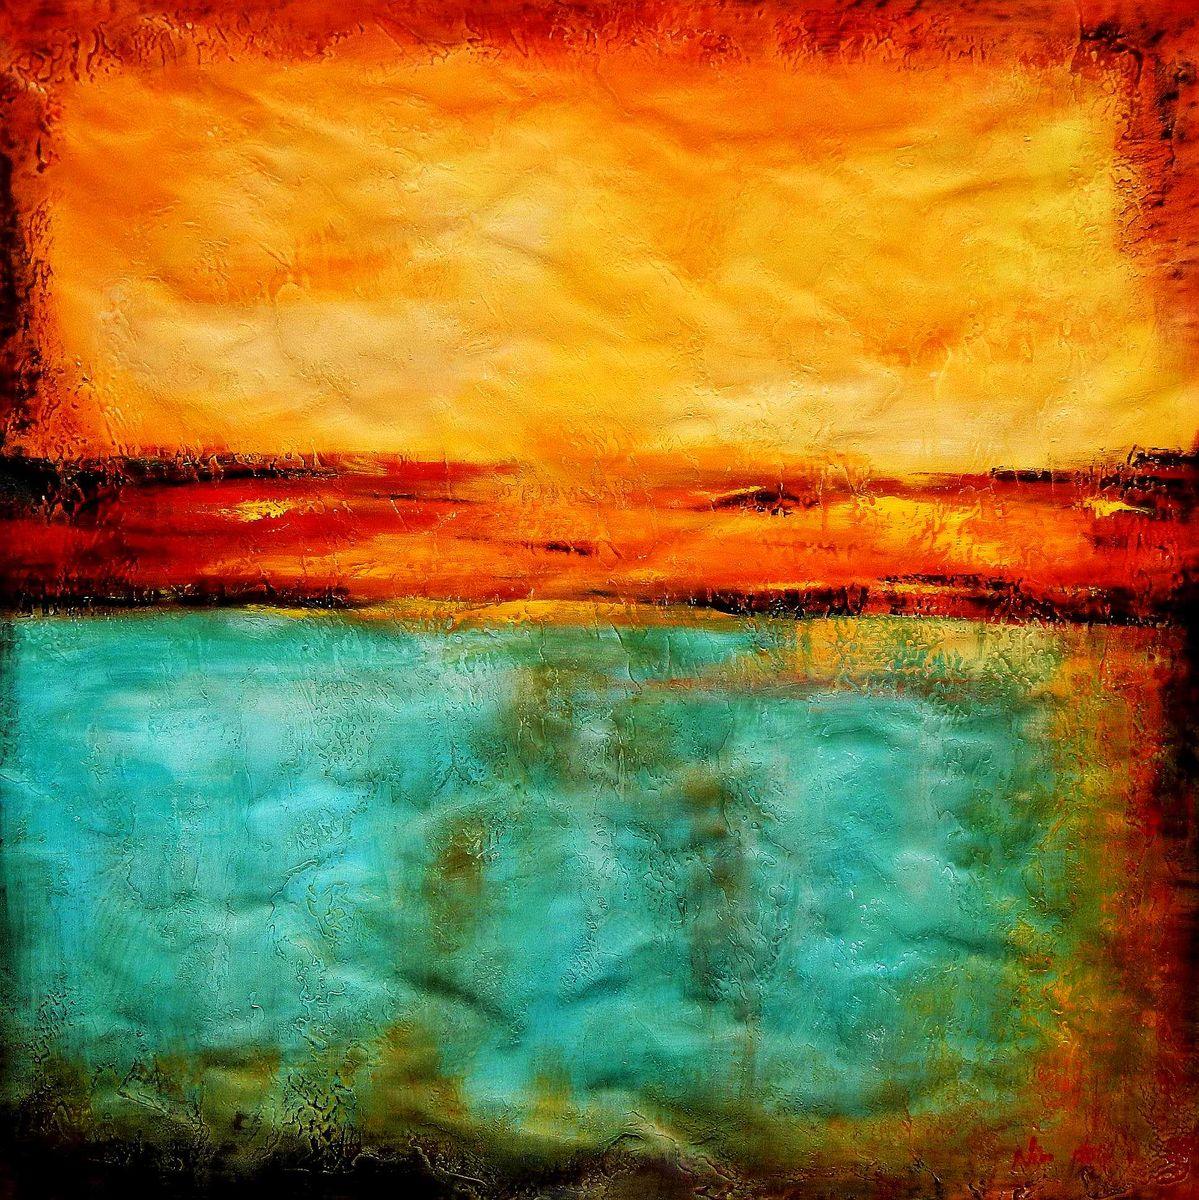 Abstract - Mirage in Babylon h95889 90x90cm abstraktes Ölbild